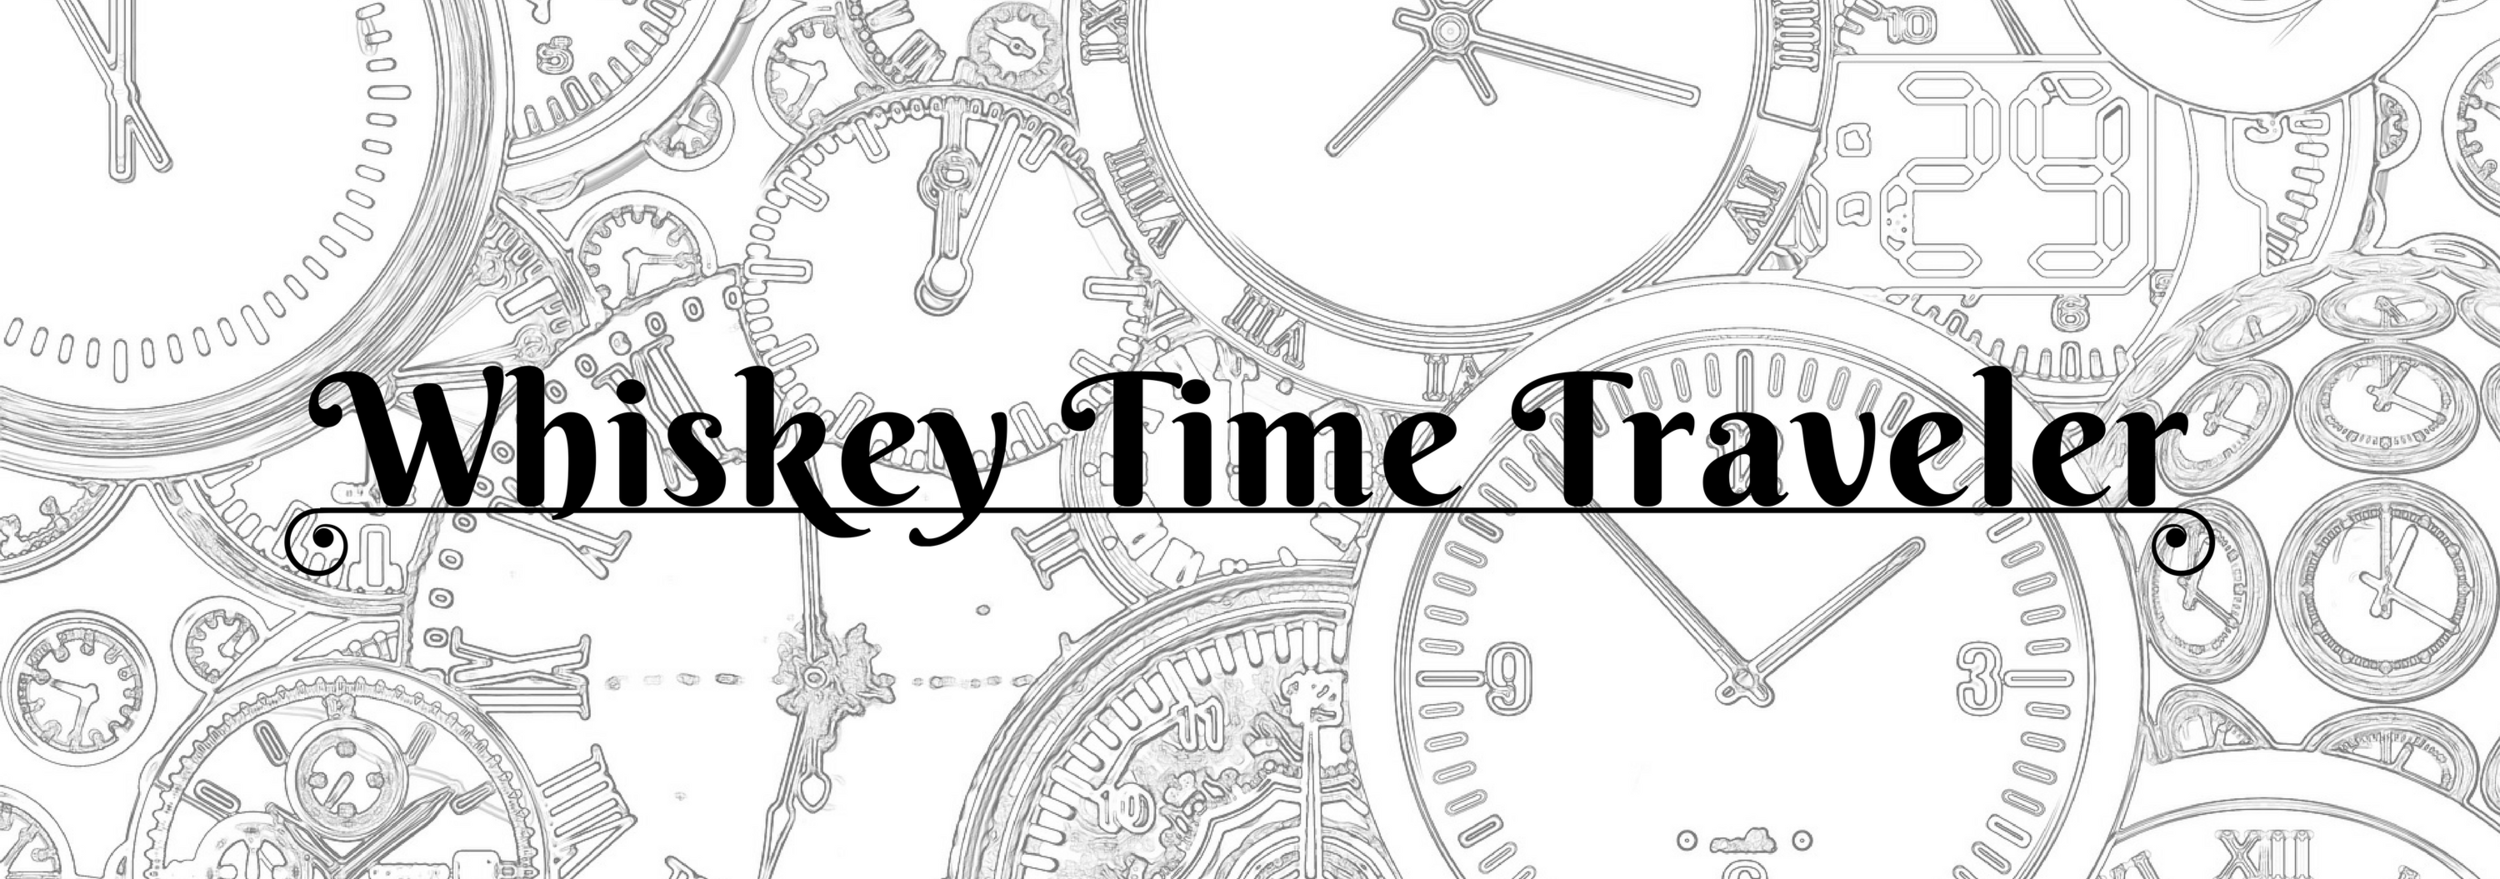 whiskey-time-traveler.png